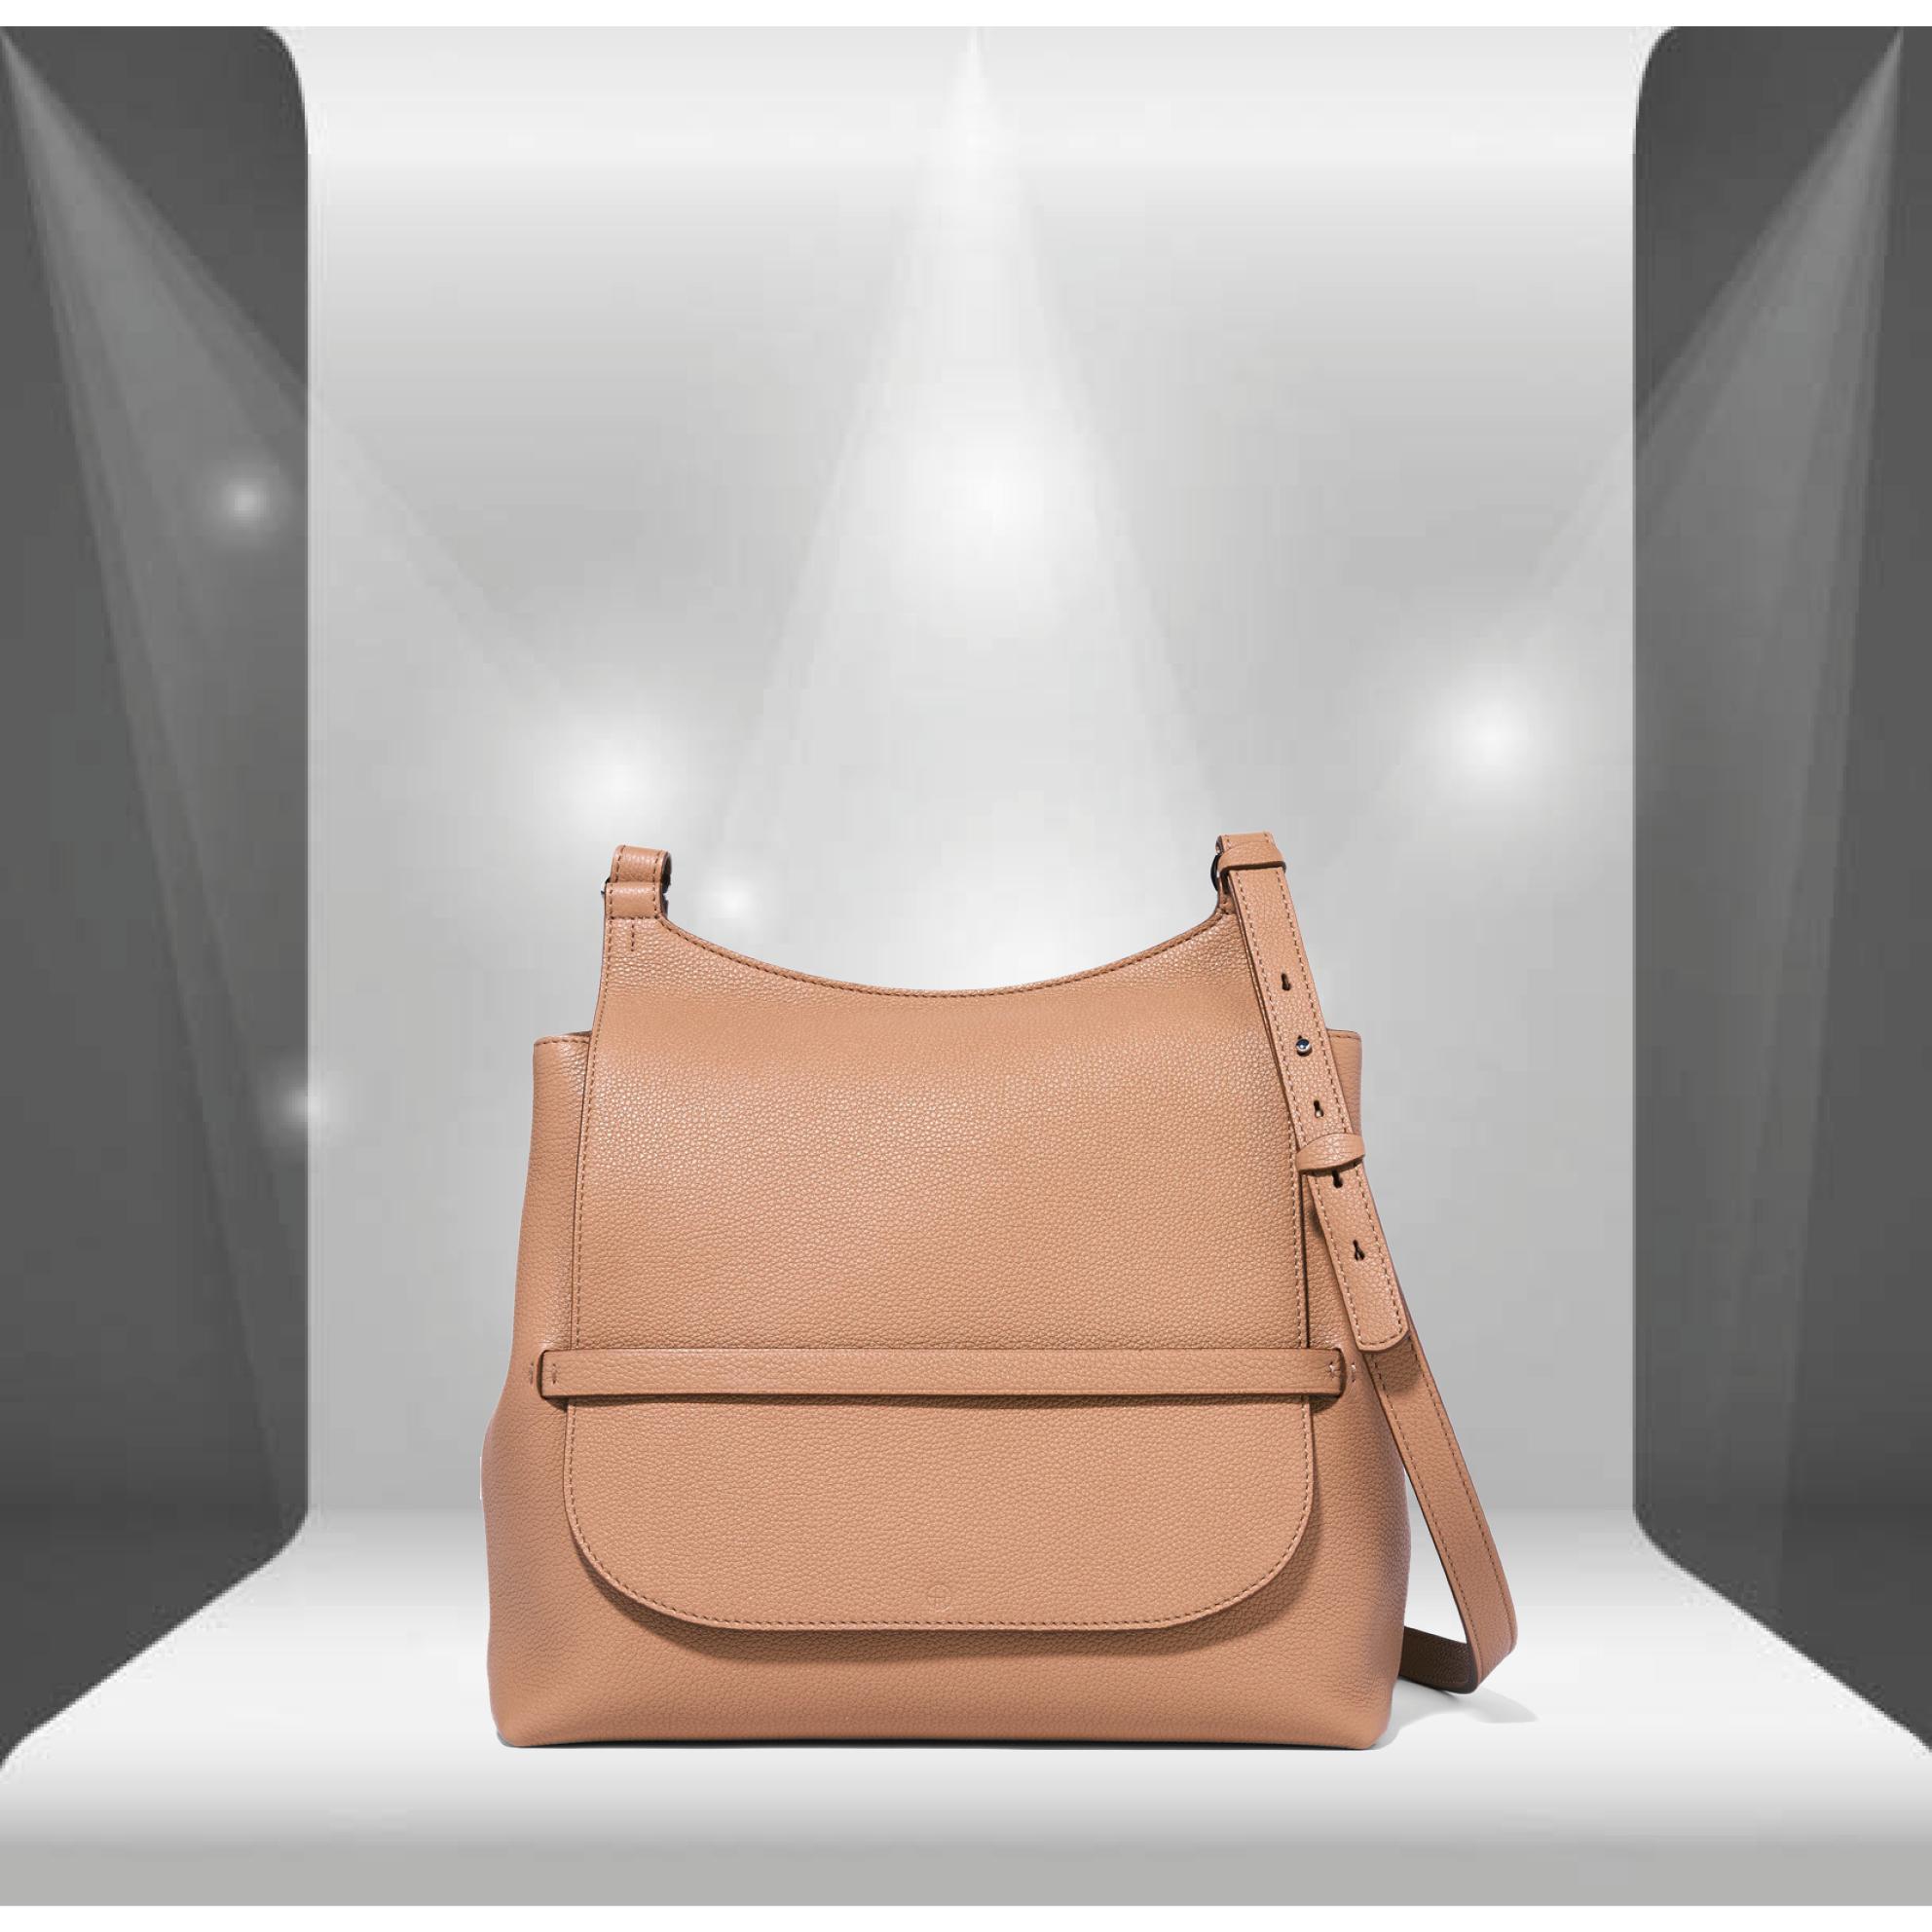 Вещь дня: бежевая сумка The Row-320x180